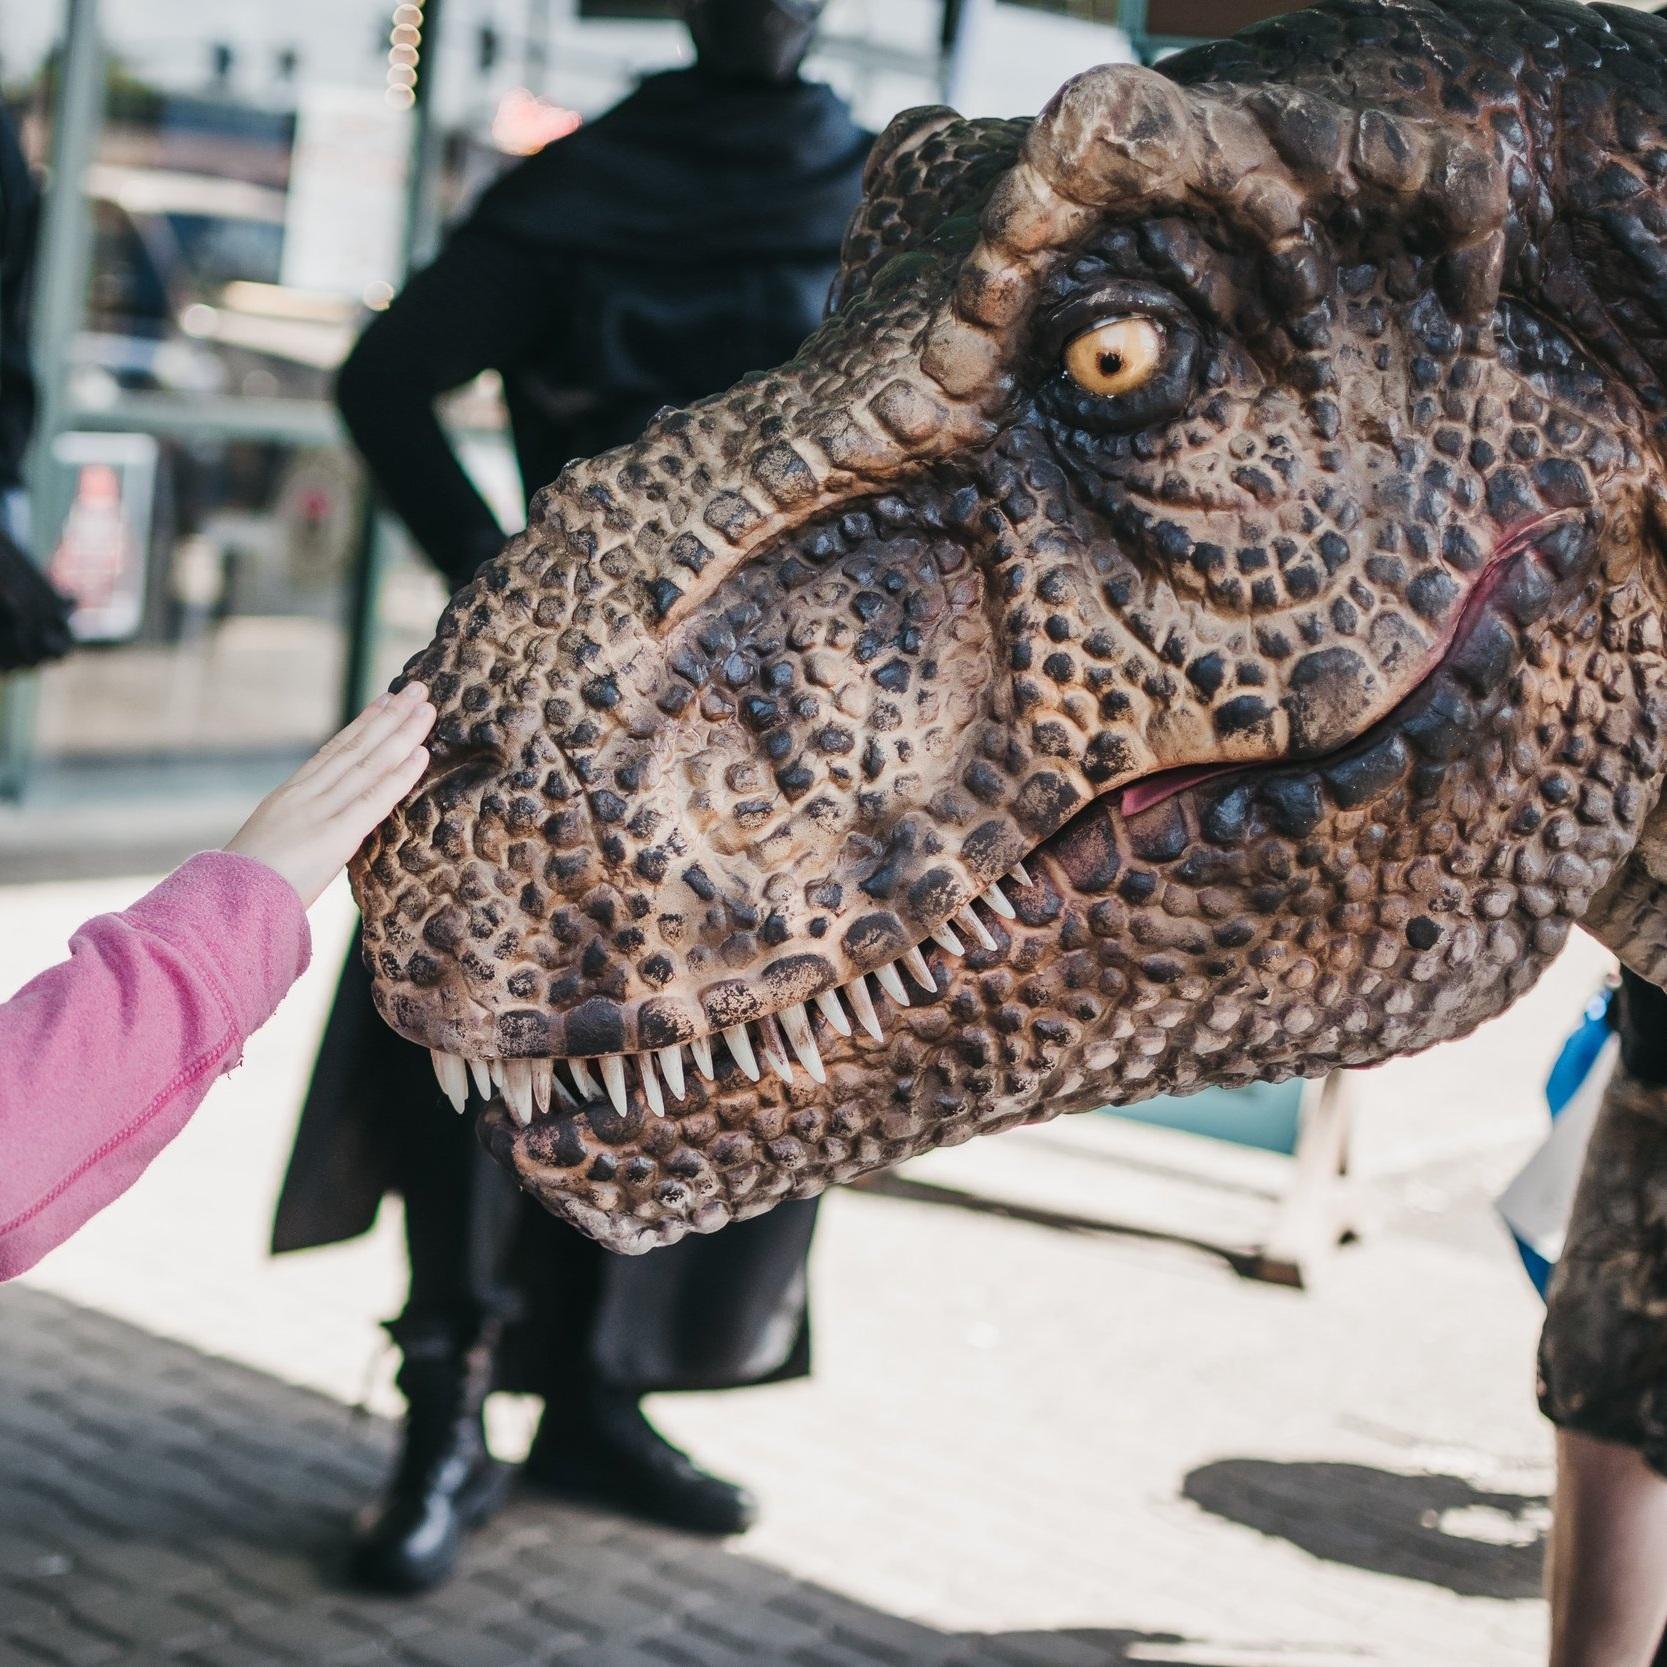 rent+a+dinosaur+portland